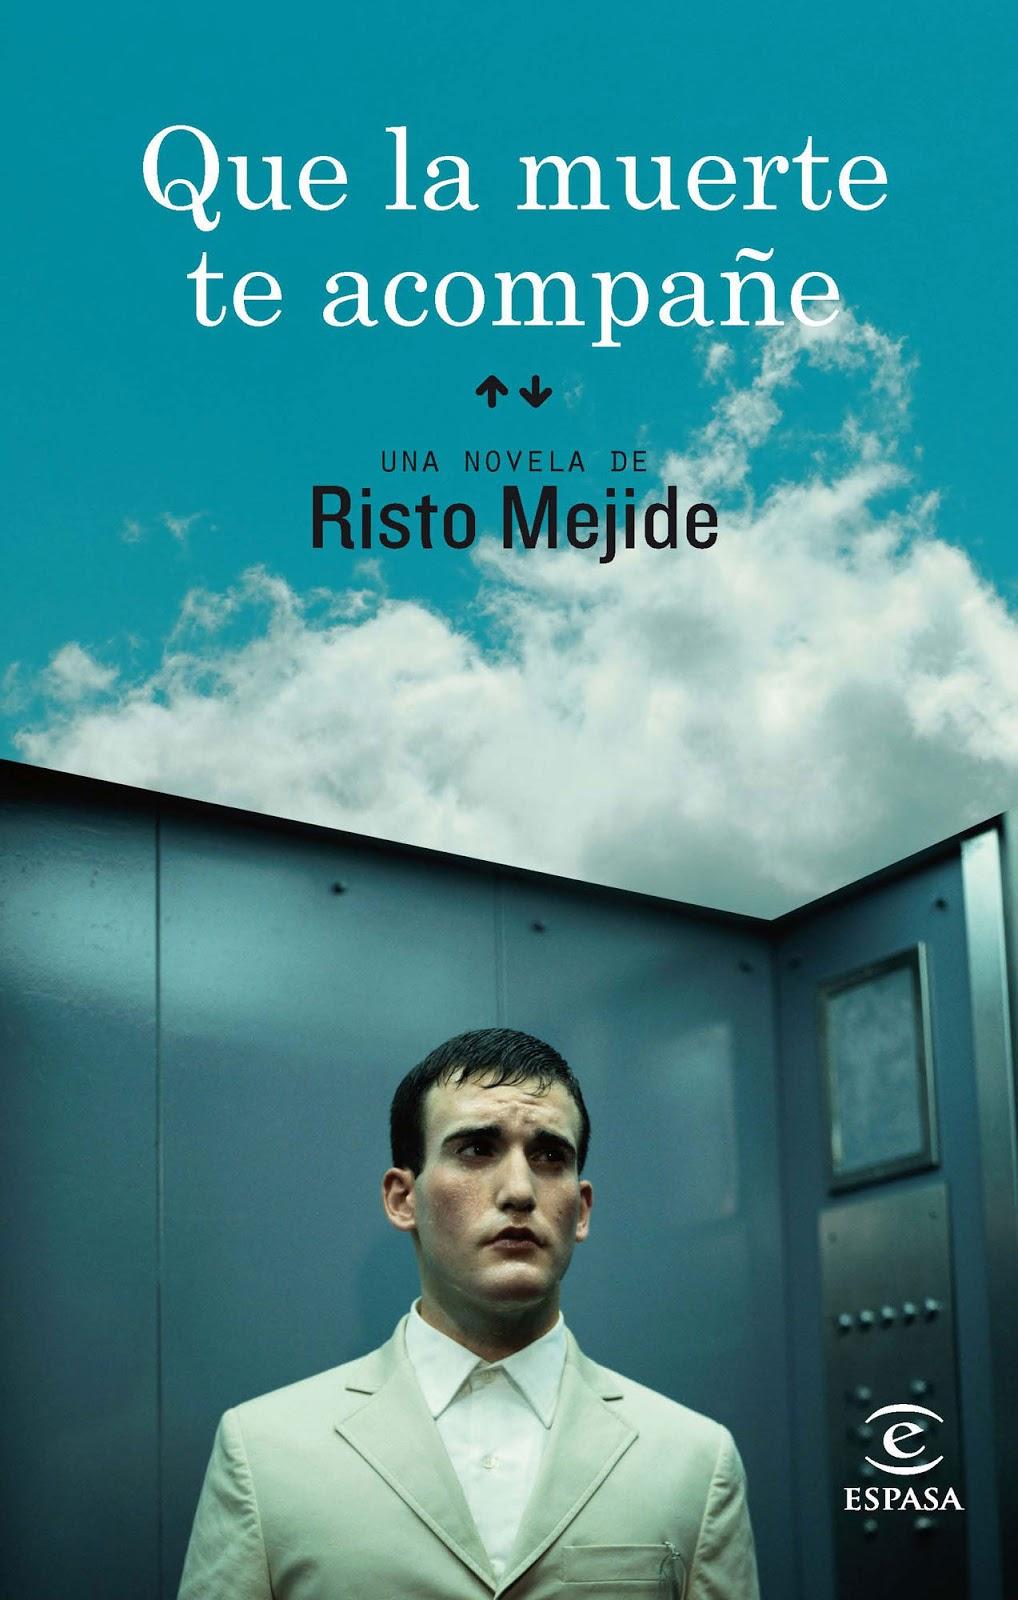 https://labibliotecadebella.blogspot.com.es/2016/09/que-la-muerte-te-acompane-risto-mejide.html